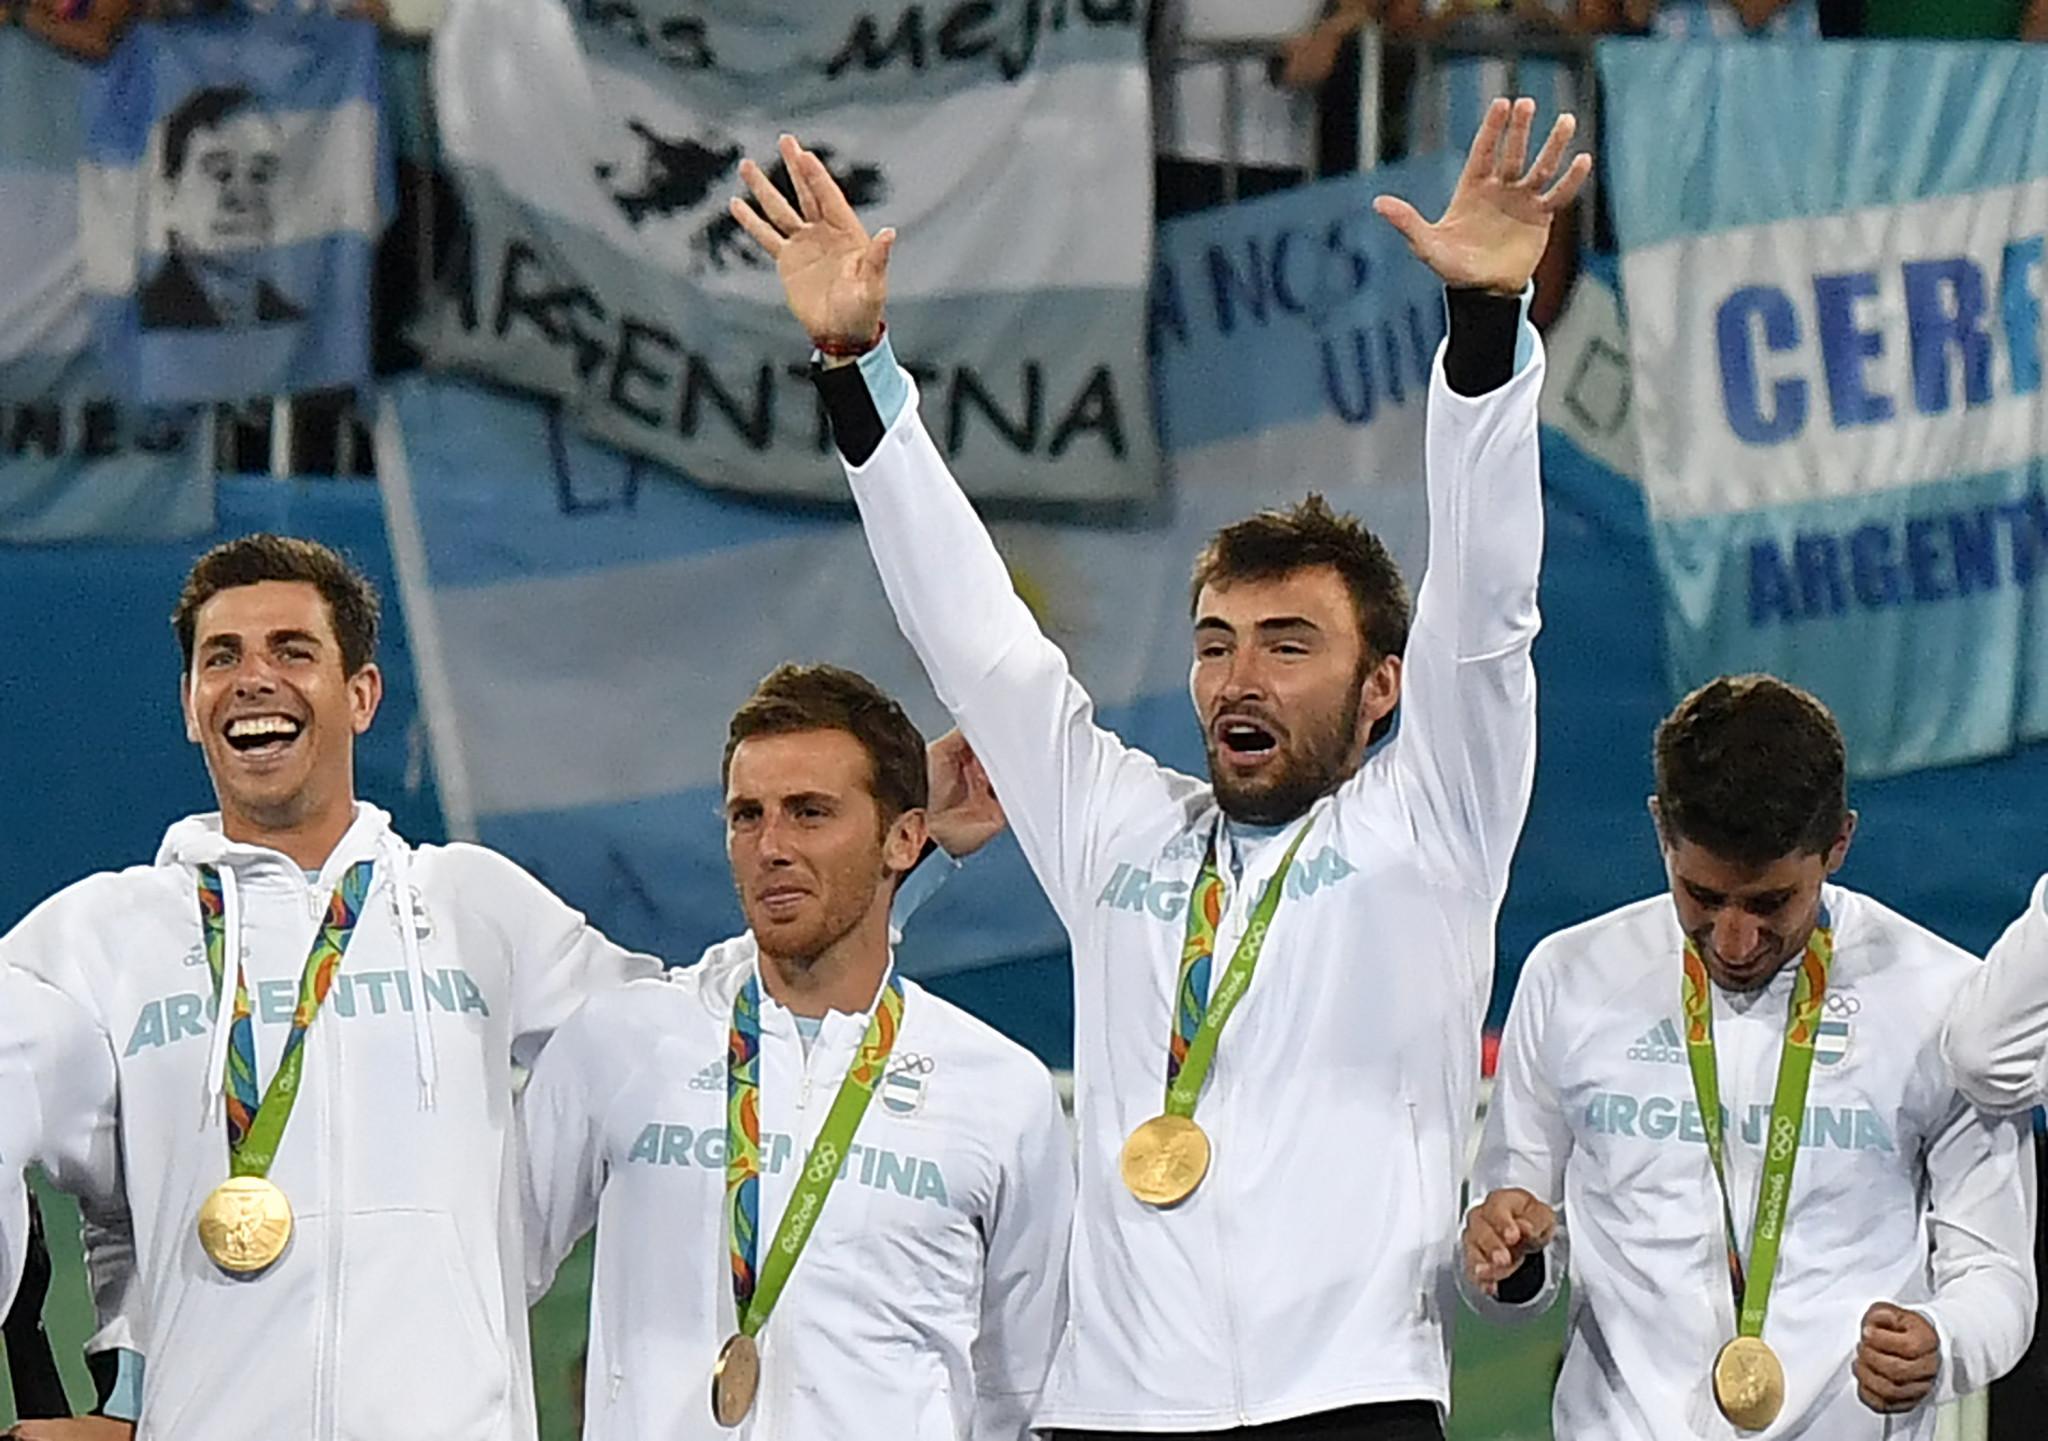 Defending men's hockey champions Argentina drawn against Australia in Tokyo 2020 pool phase